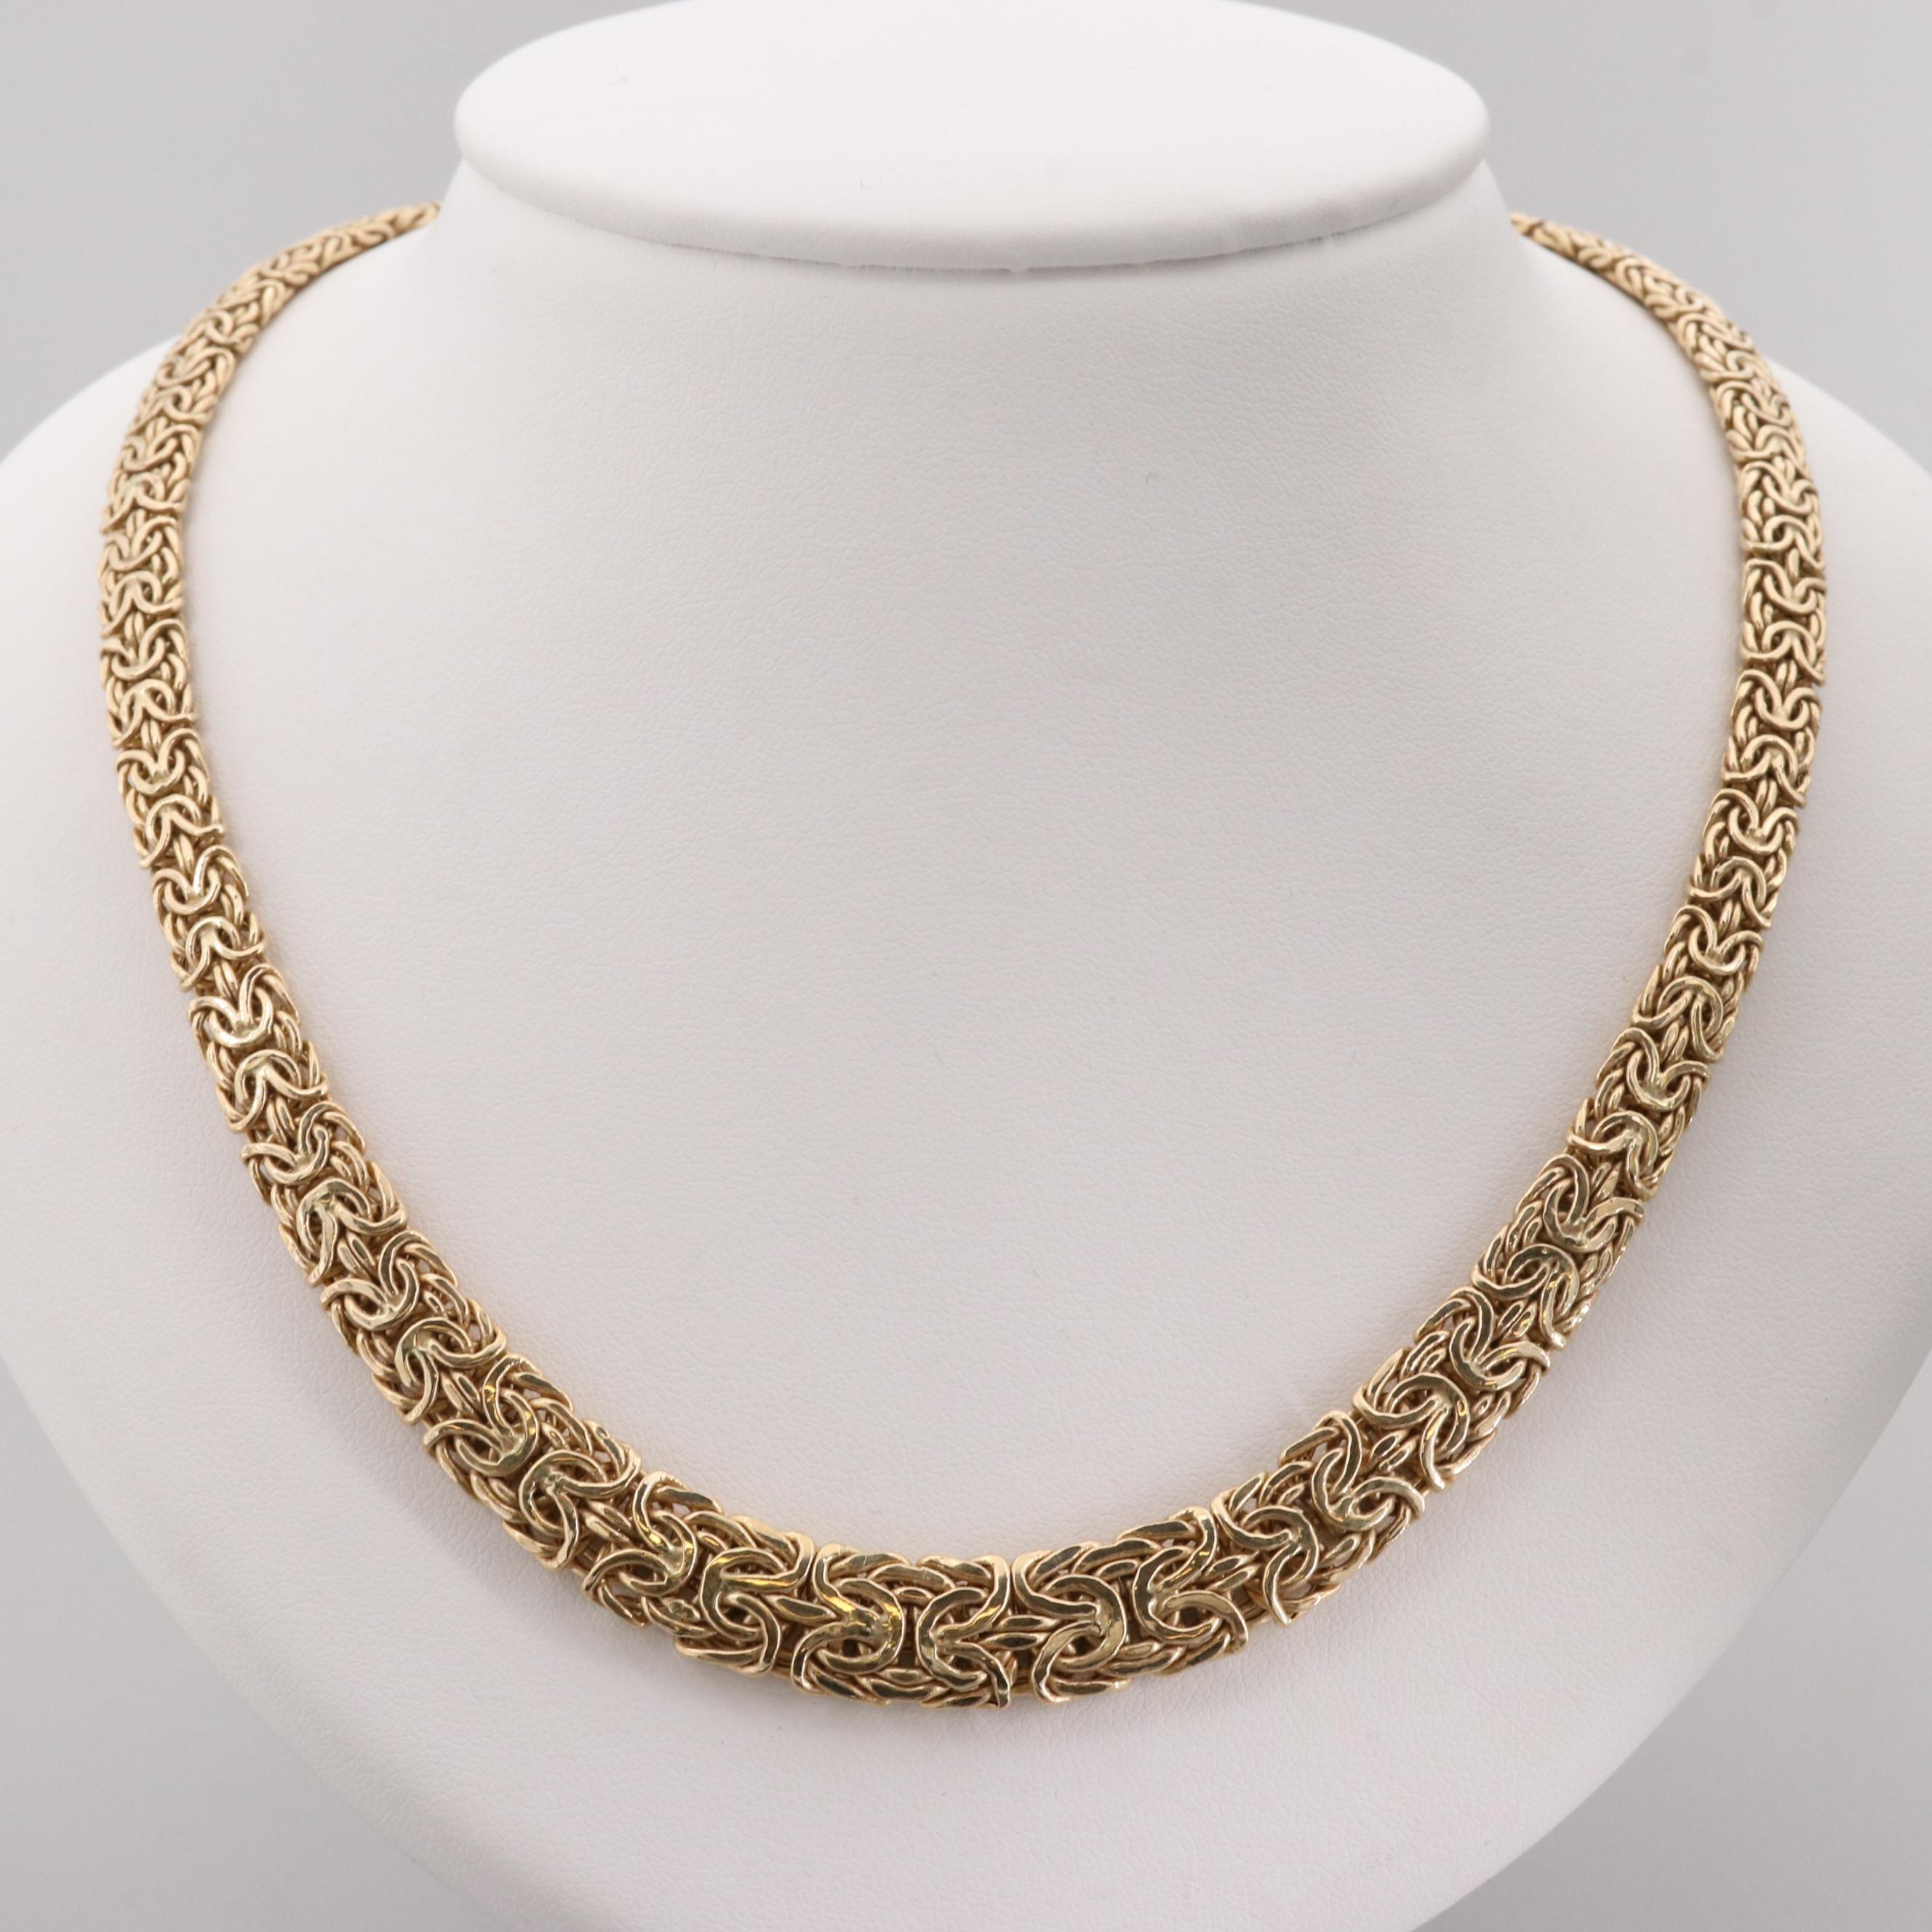 14K Yellow Gold Graduating Byzantine Necklace